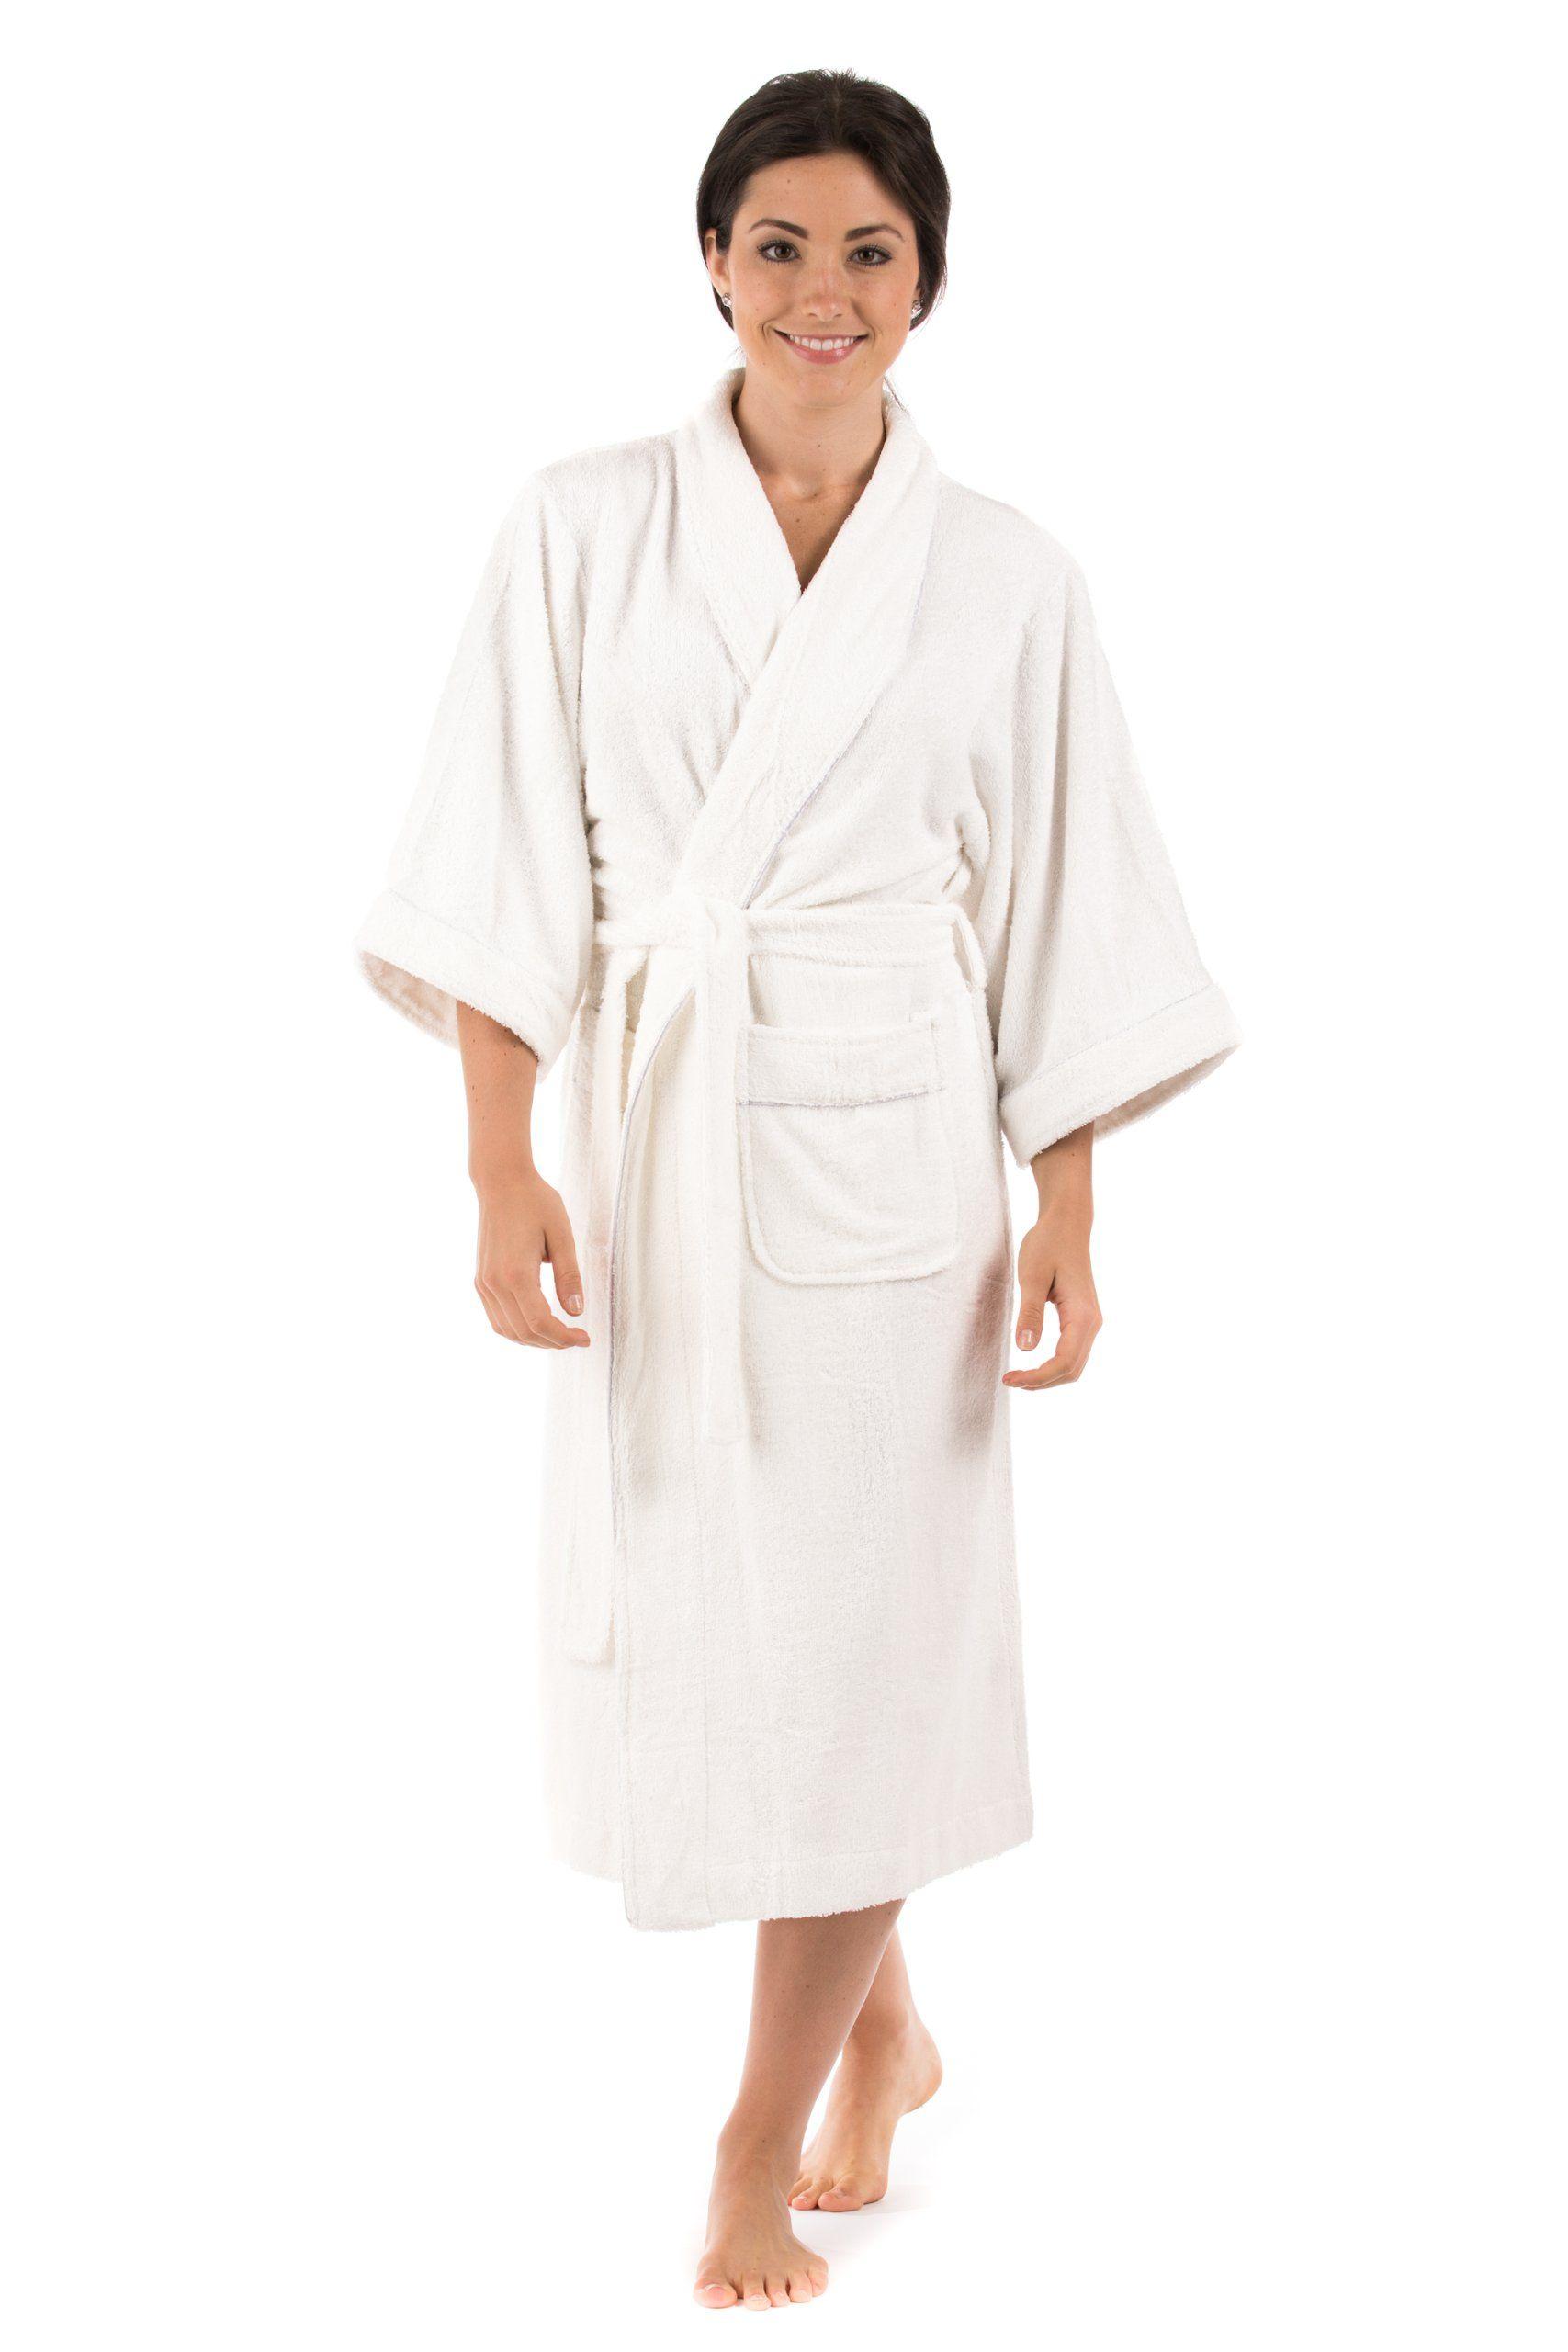 a26d6a80d0cdb  50 Women s Terry Cloth Bathrobe Robe (Ecovaganza)  An Eco Friendly Gift of  Luxury at Amazon Women s Clothing store  Plush Terry Cloth Robe